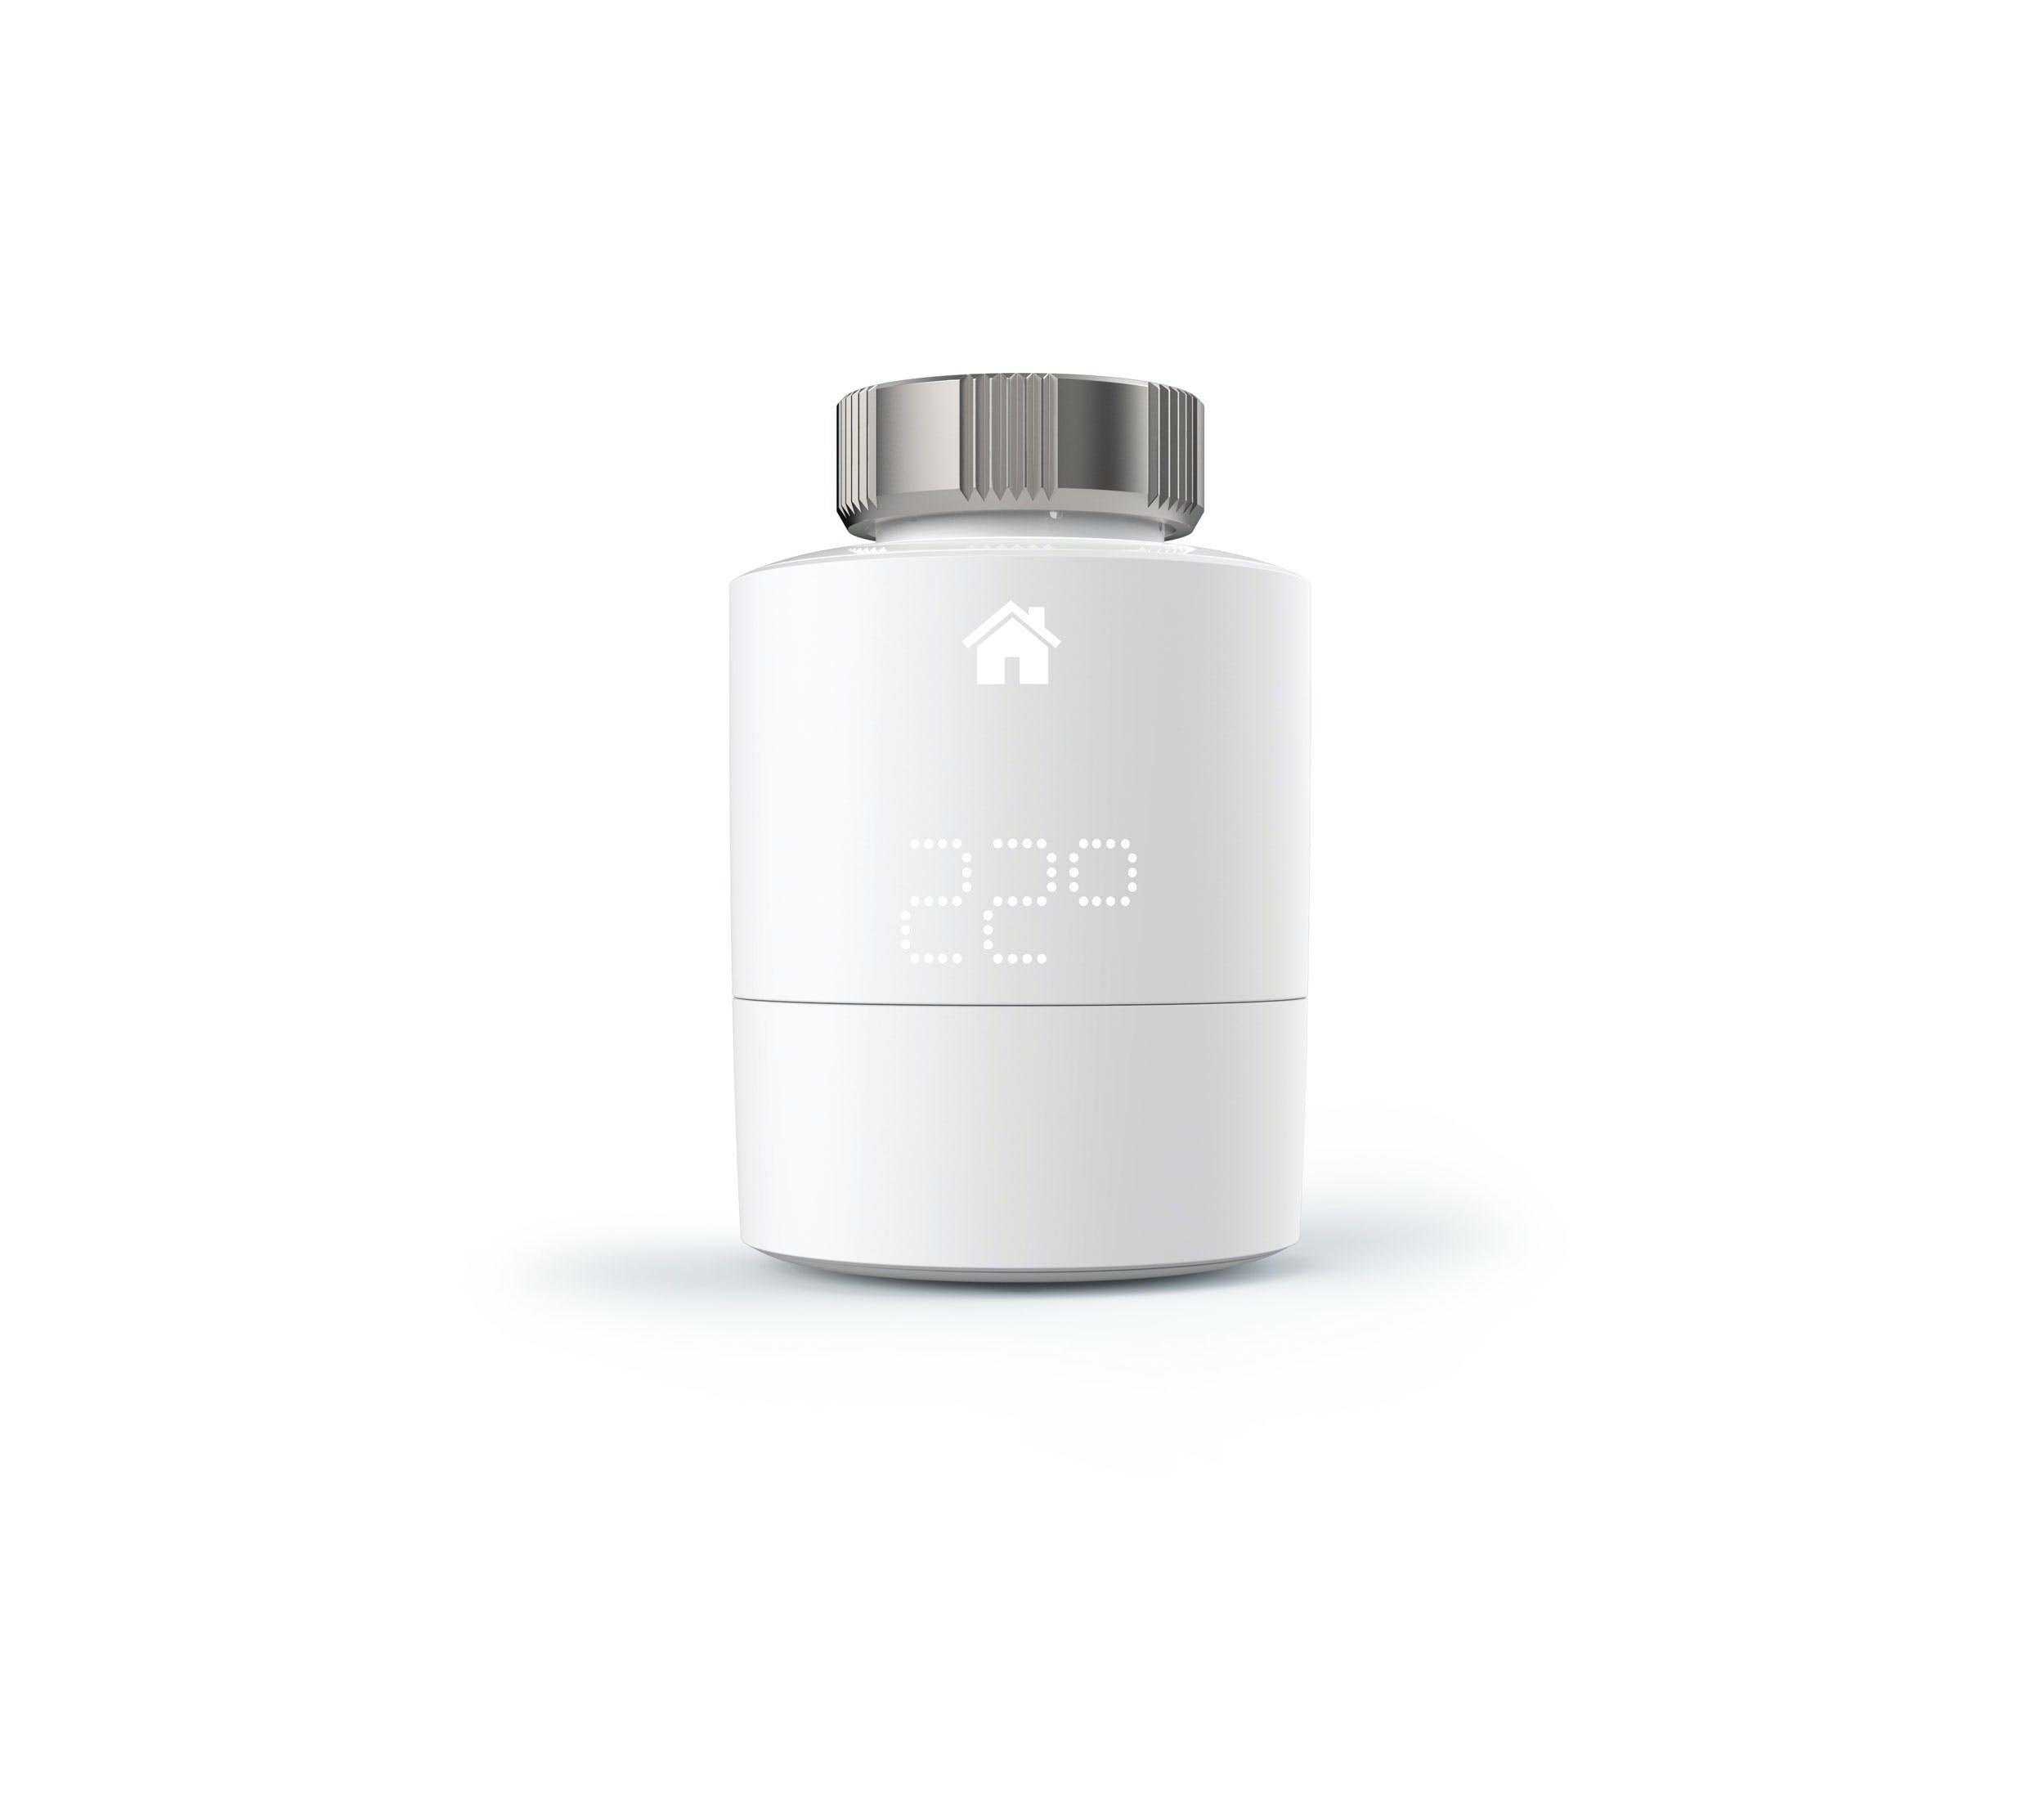 TADO – SMART RADIATORTERMOSTAT